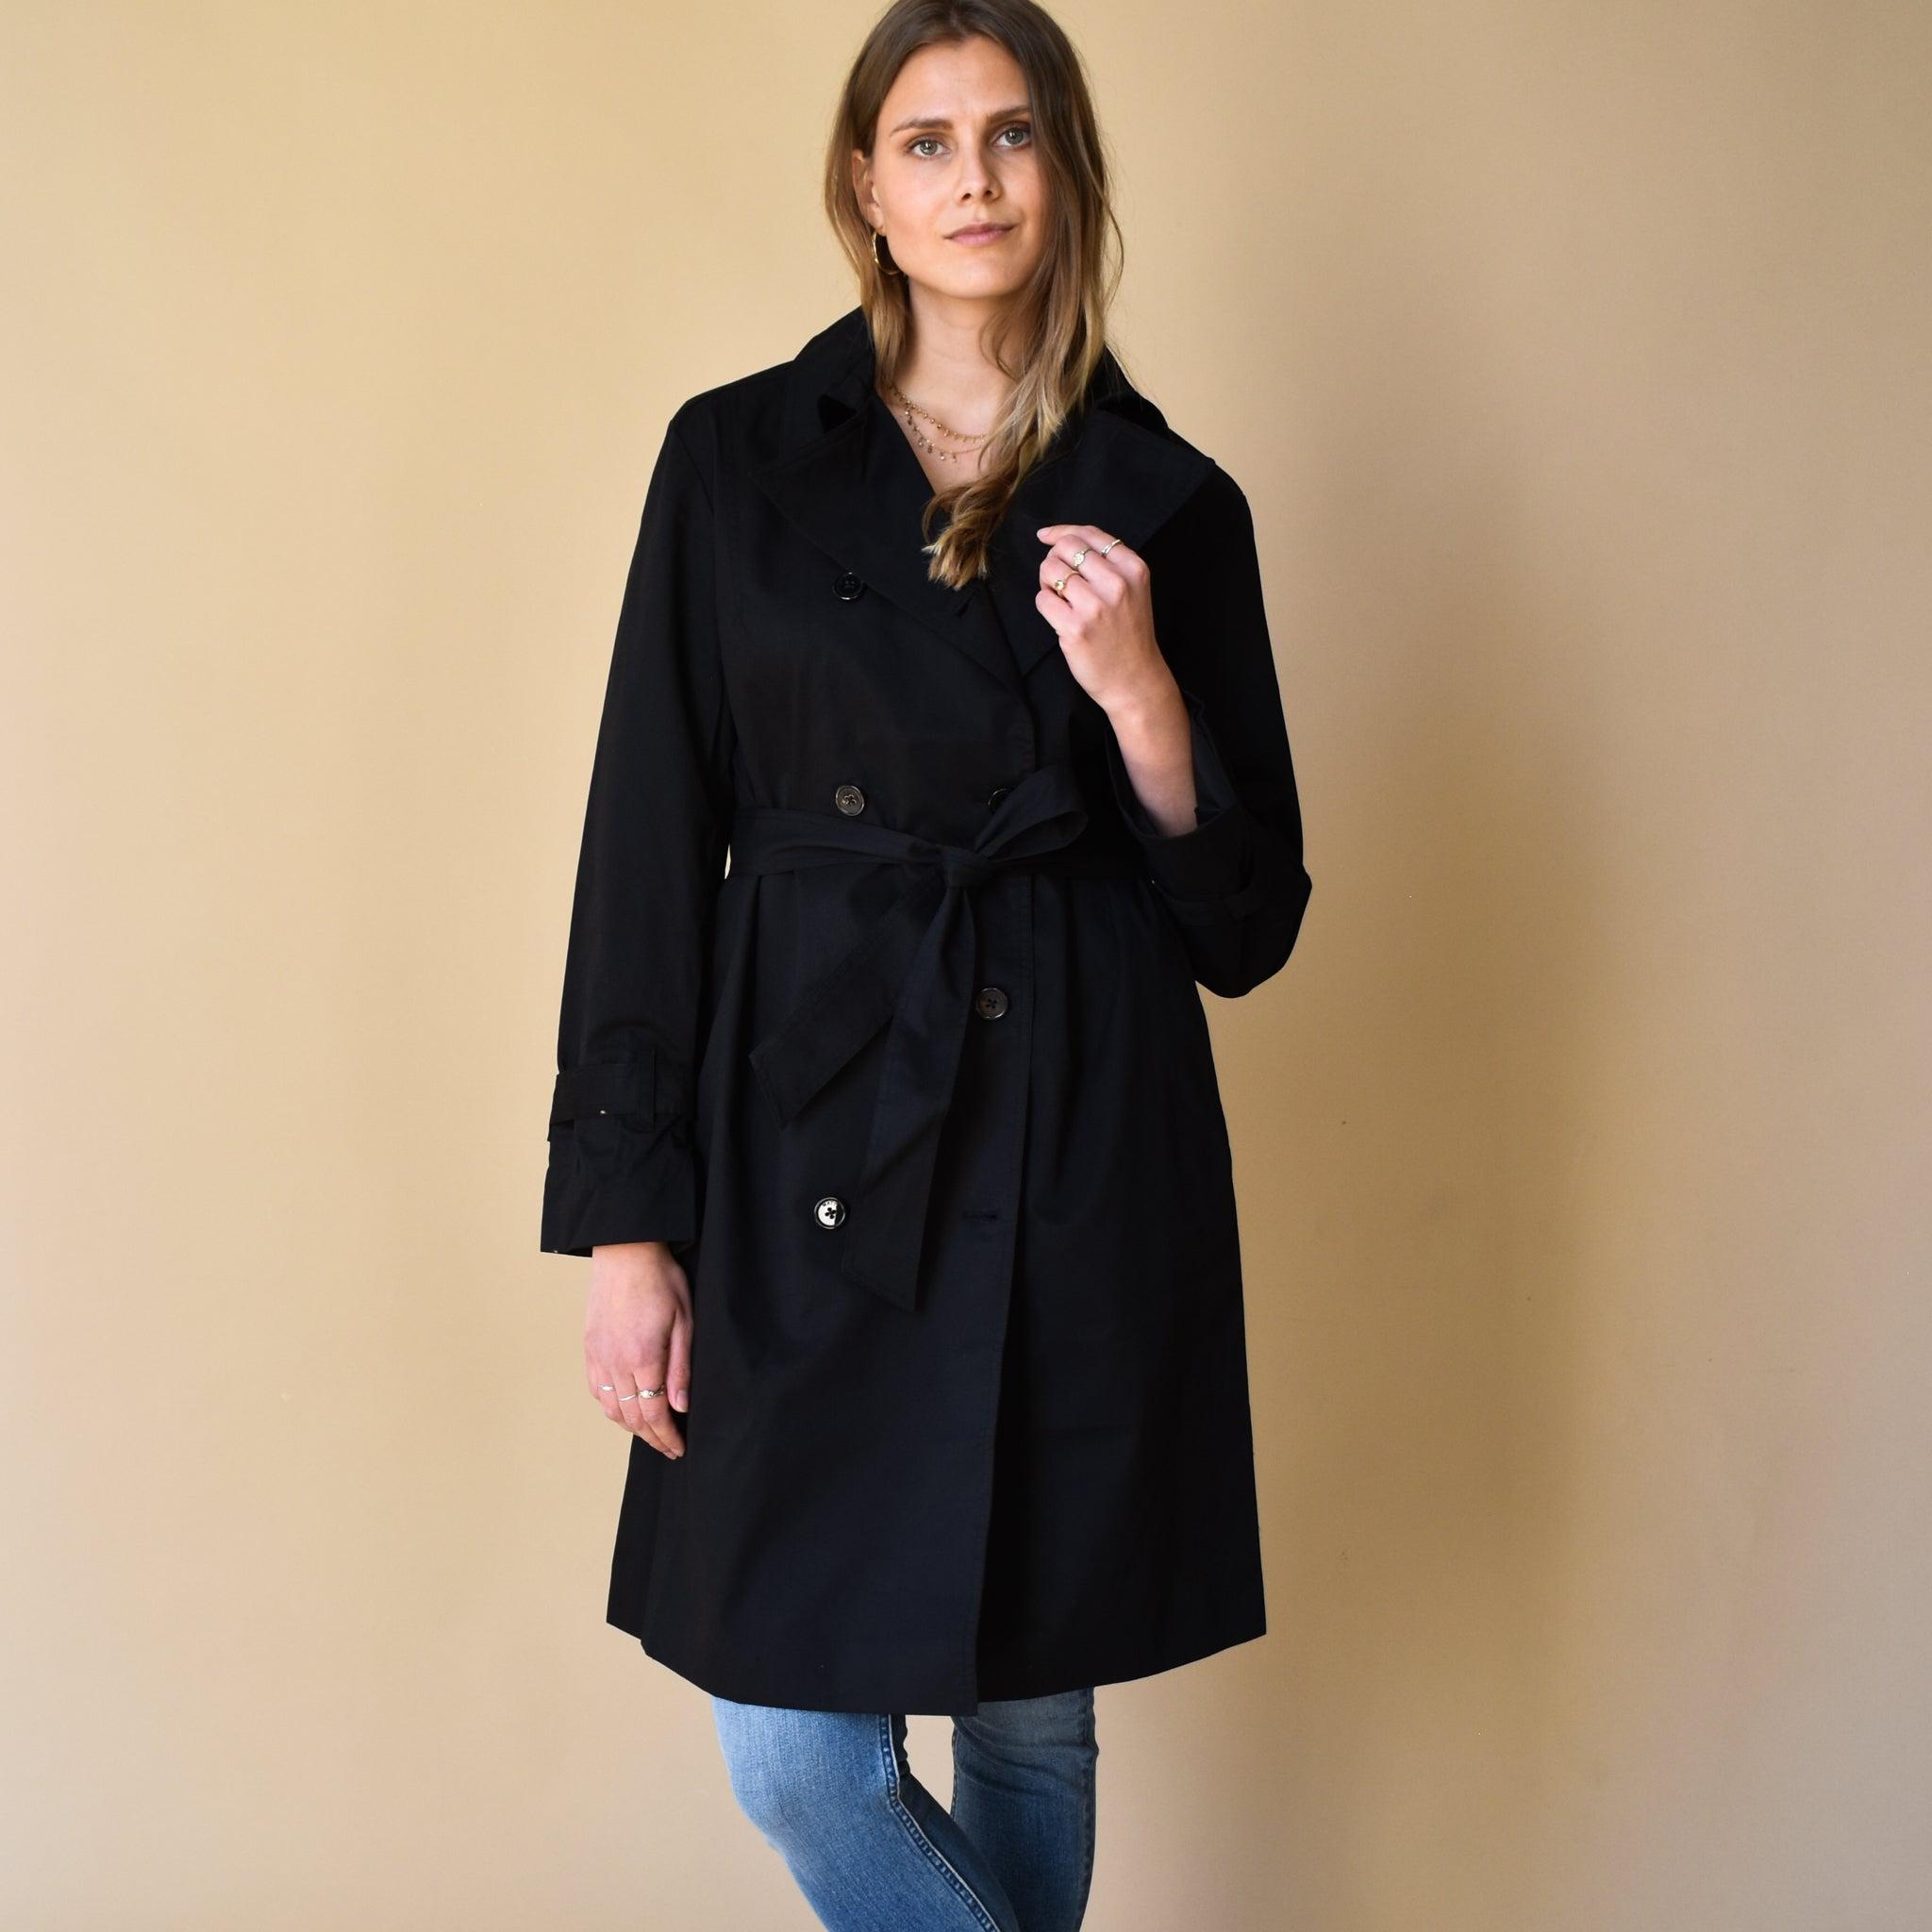 Ezra Vegan Trench Coat Black